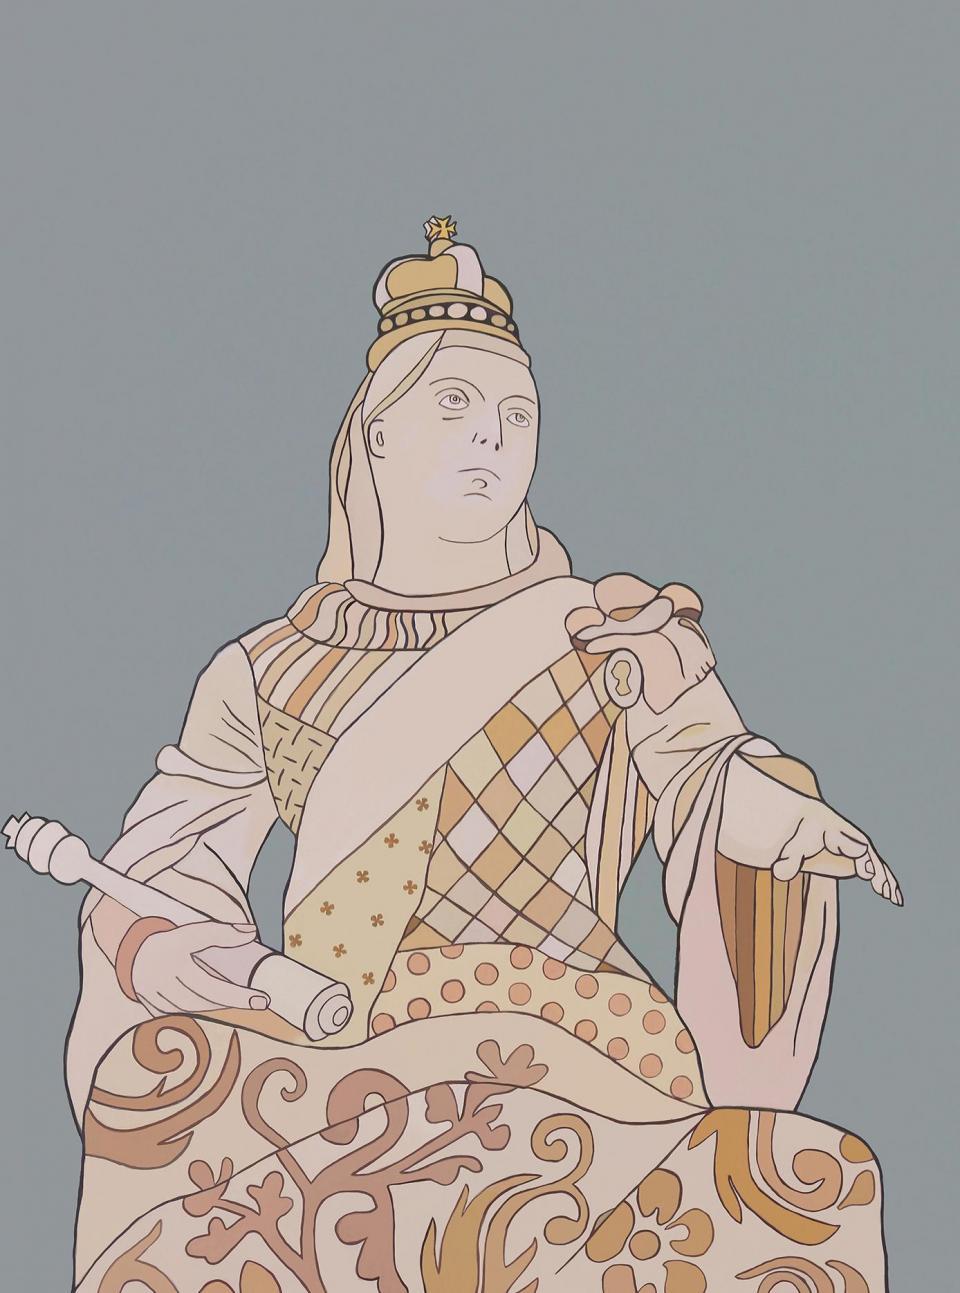 Queen Victoria Celeste